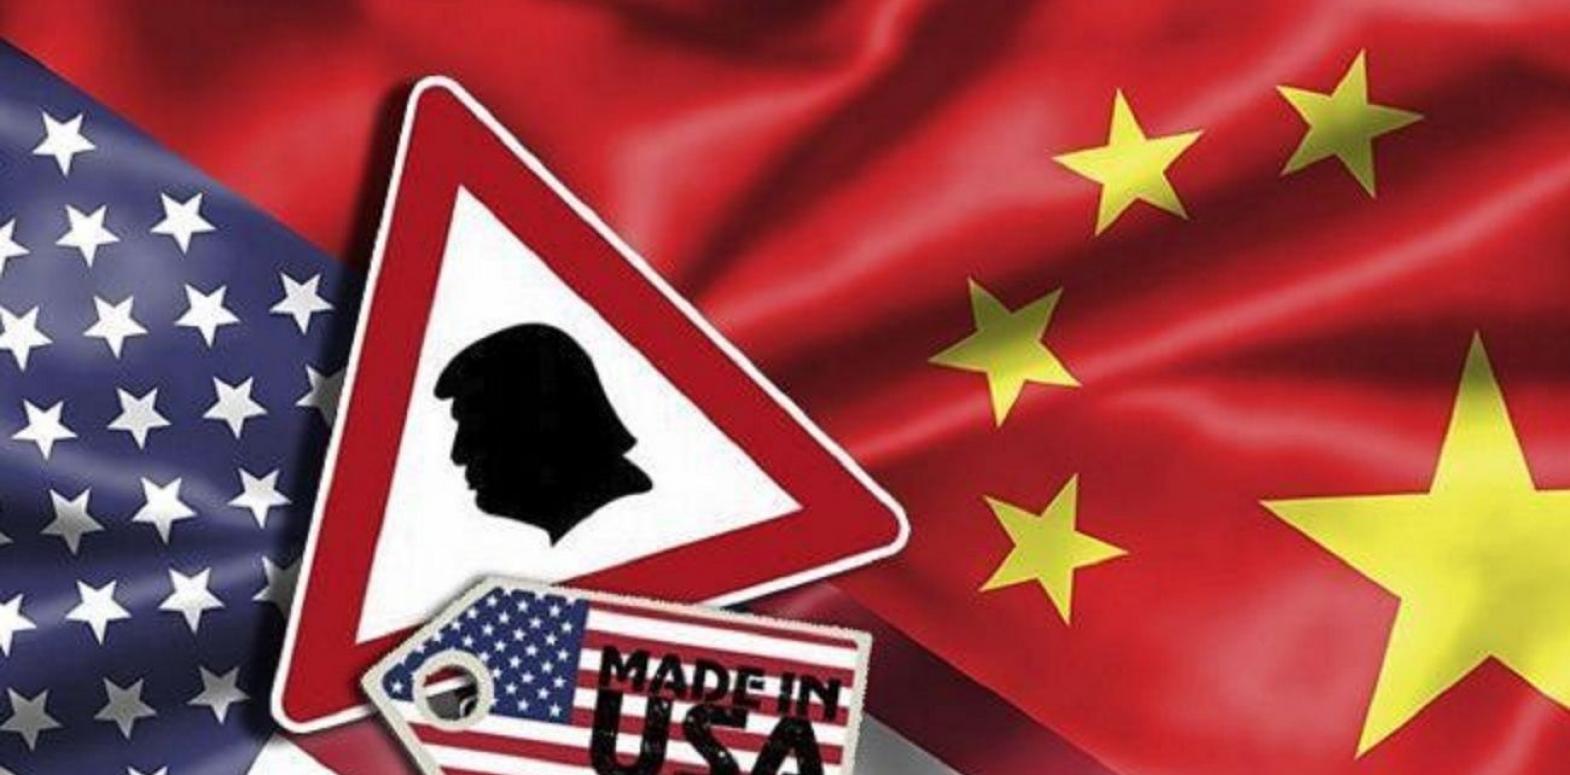 Трамп утвердил санкции против Китая из-за ситуации с Гонконгом